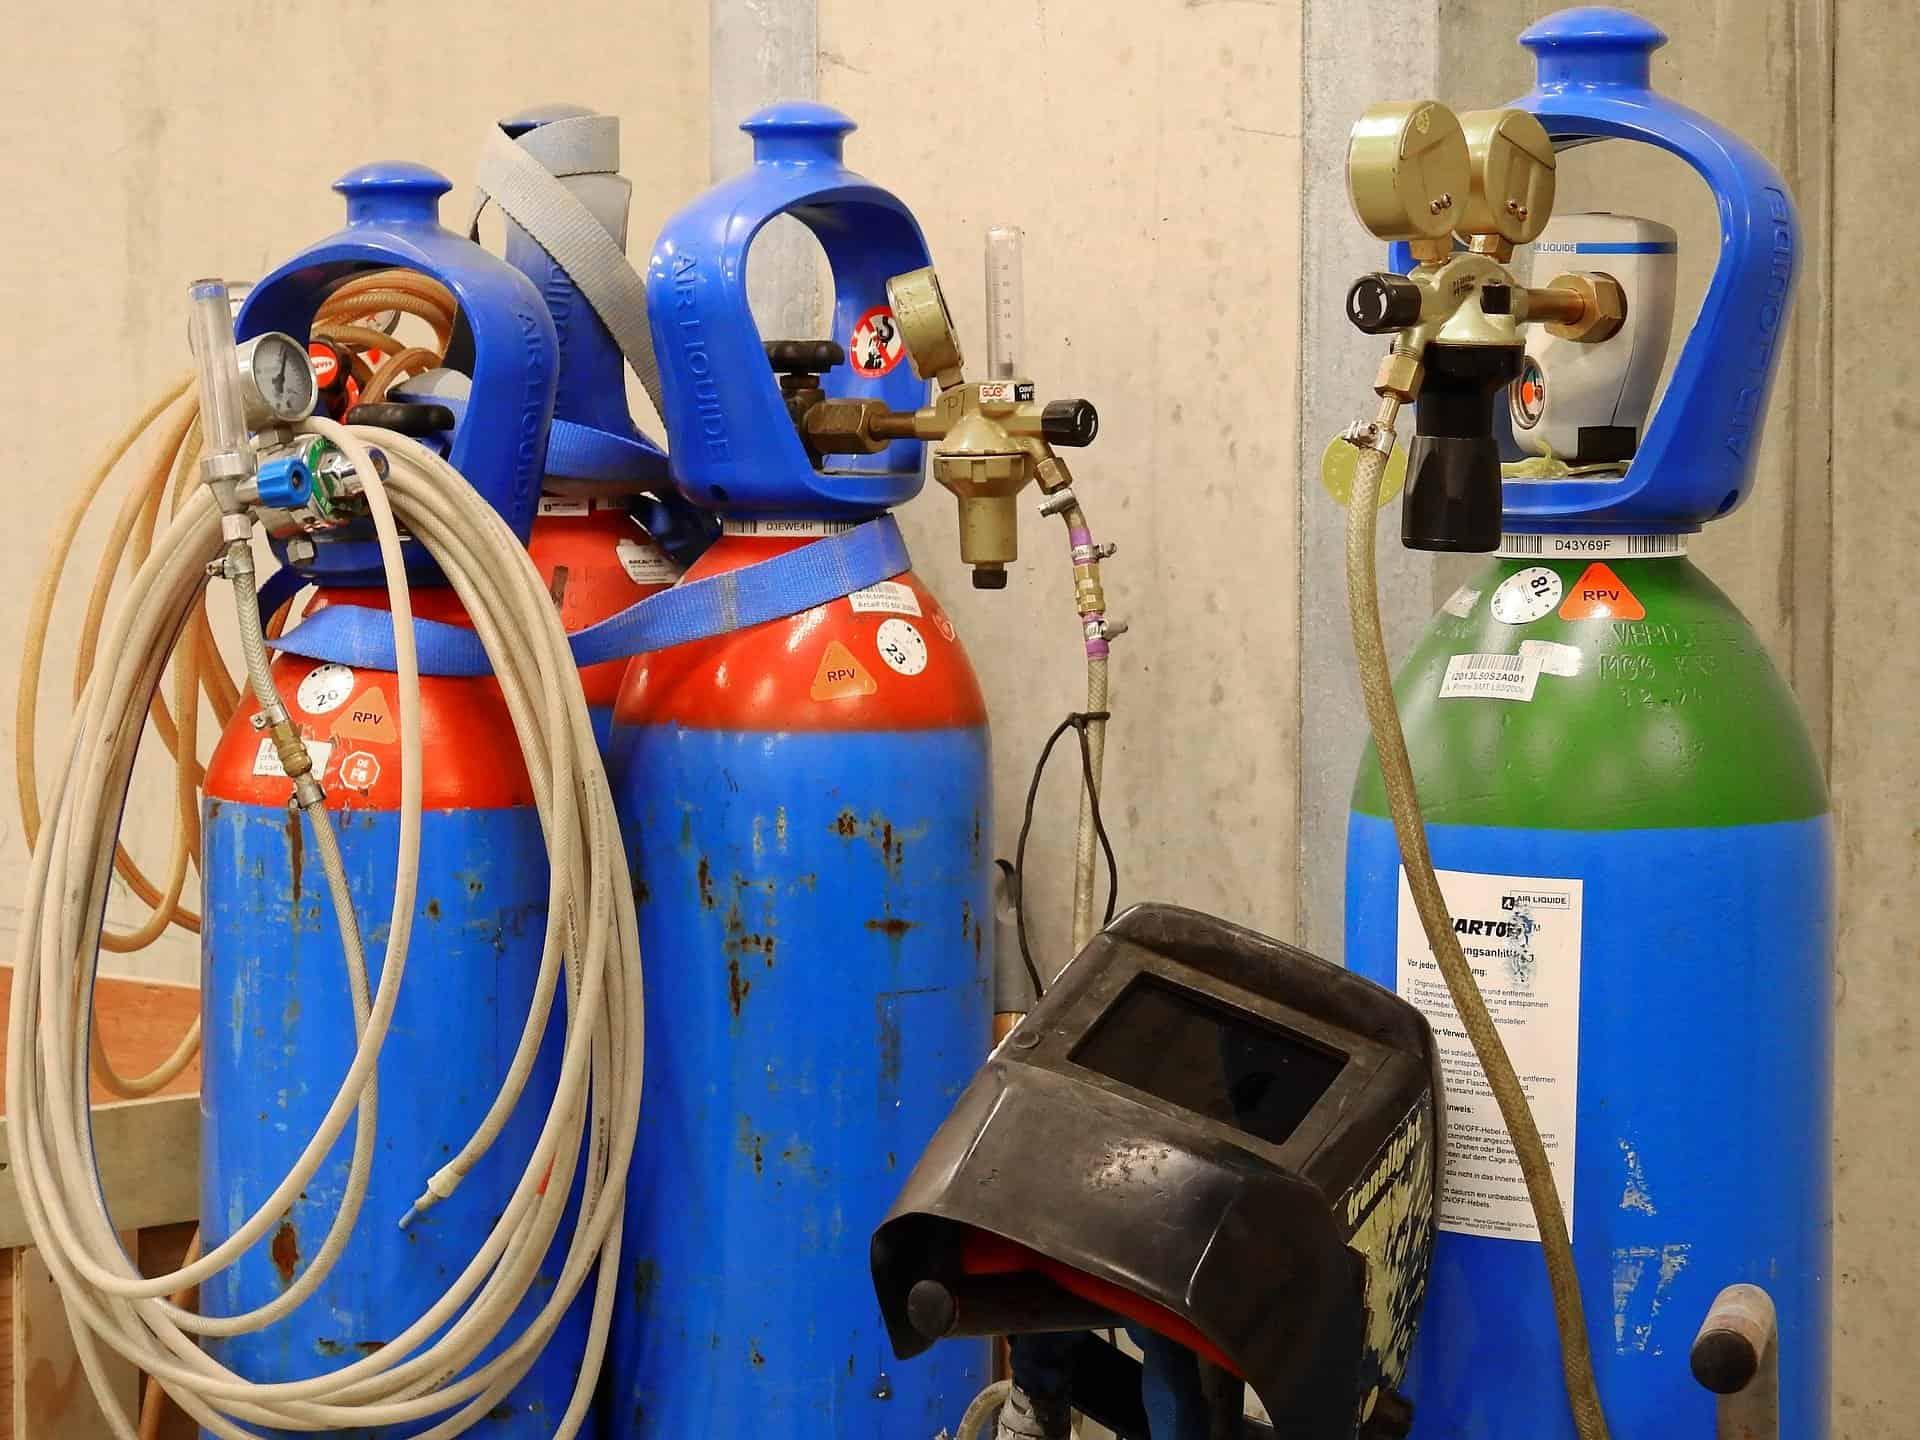 image of a welding gas setup